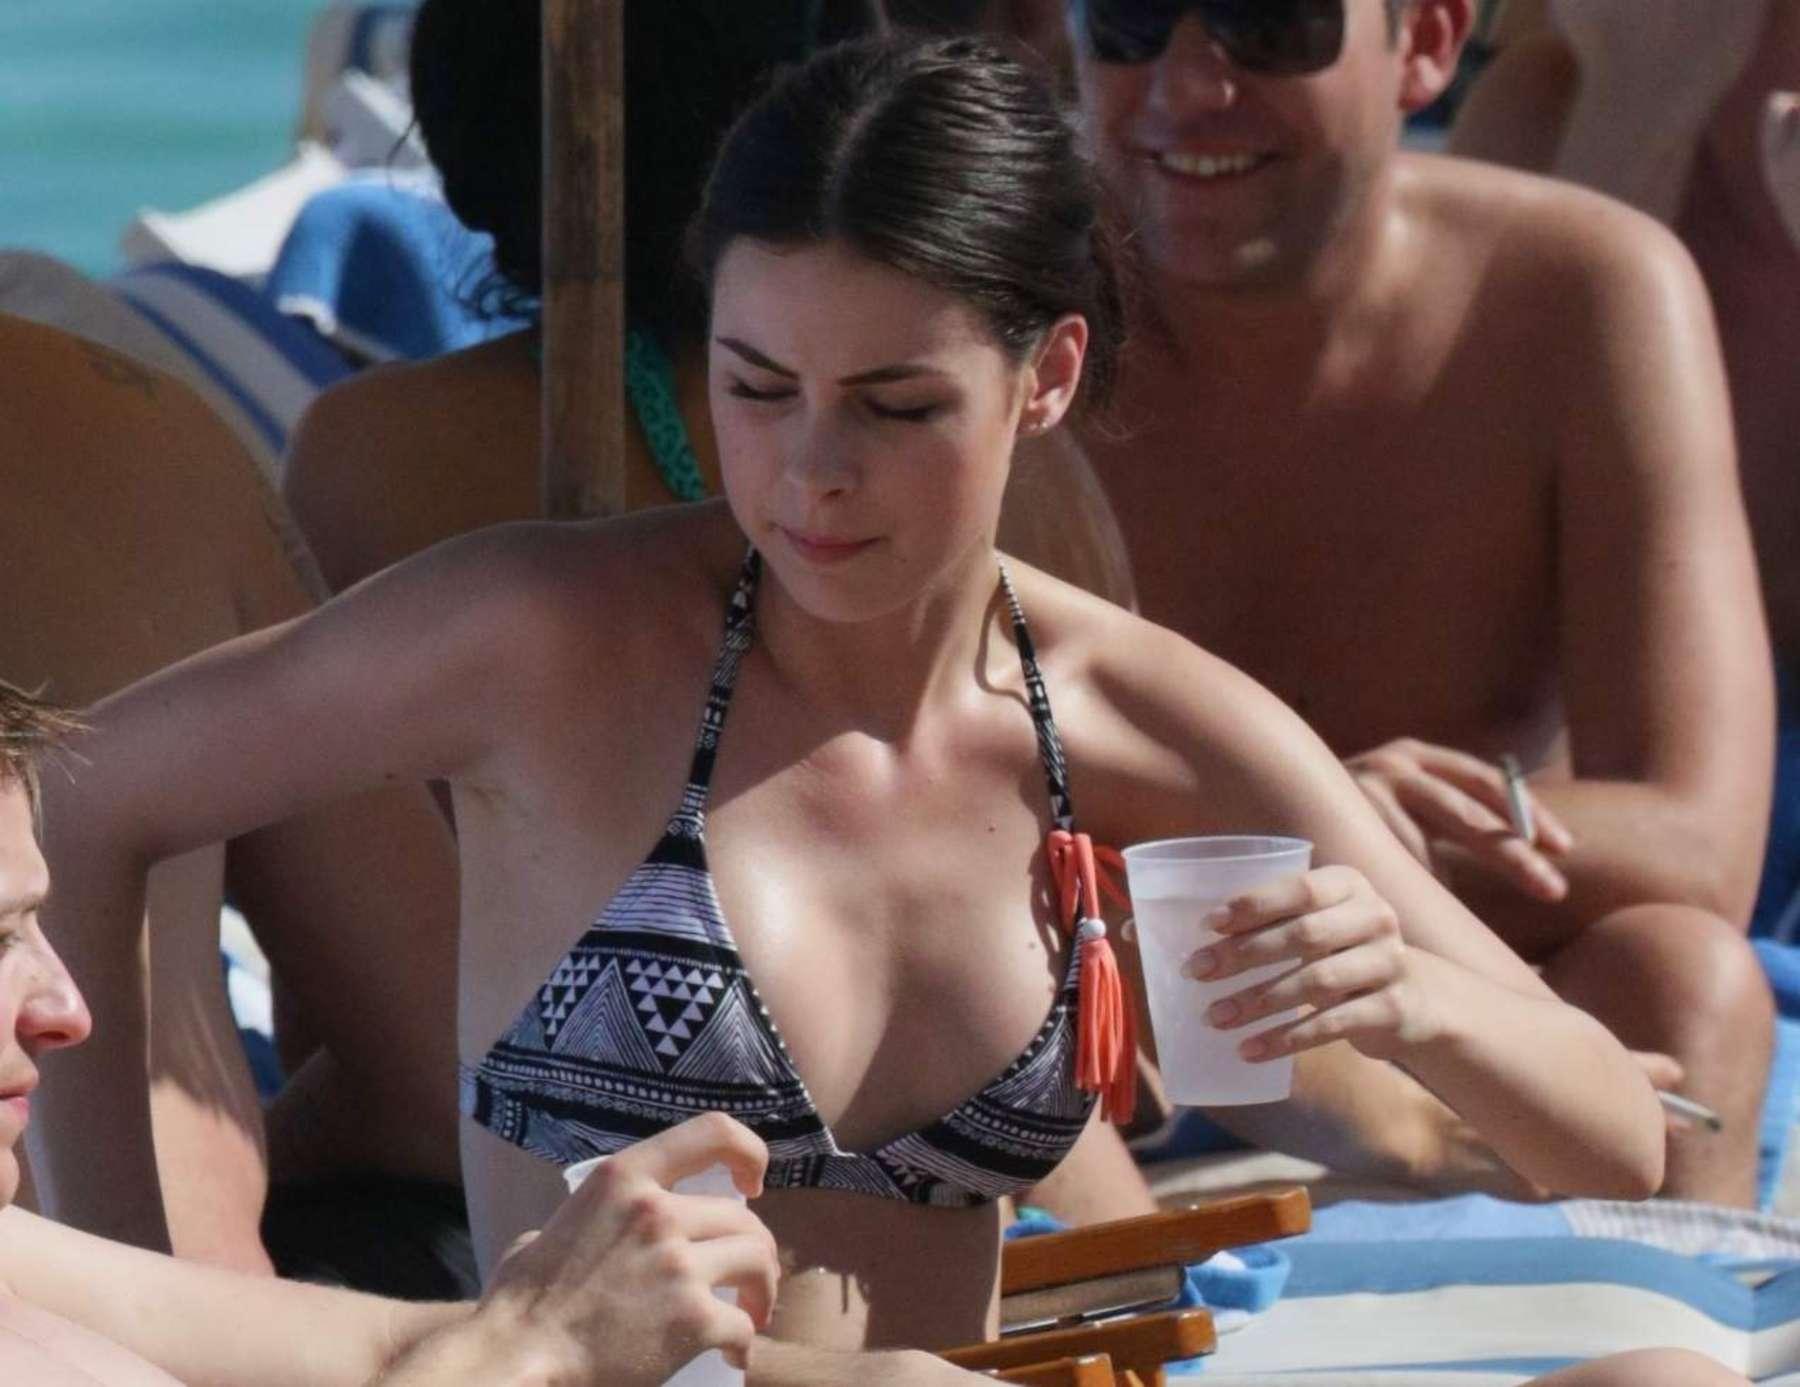 back to post lena meyer landrut wearing bikini on vacation at a